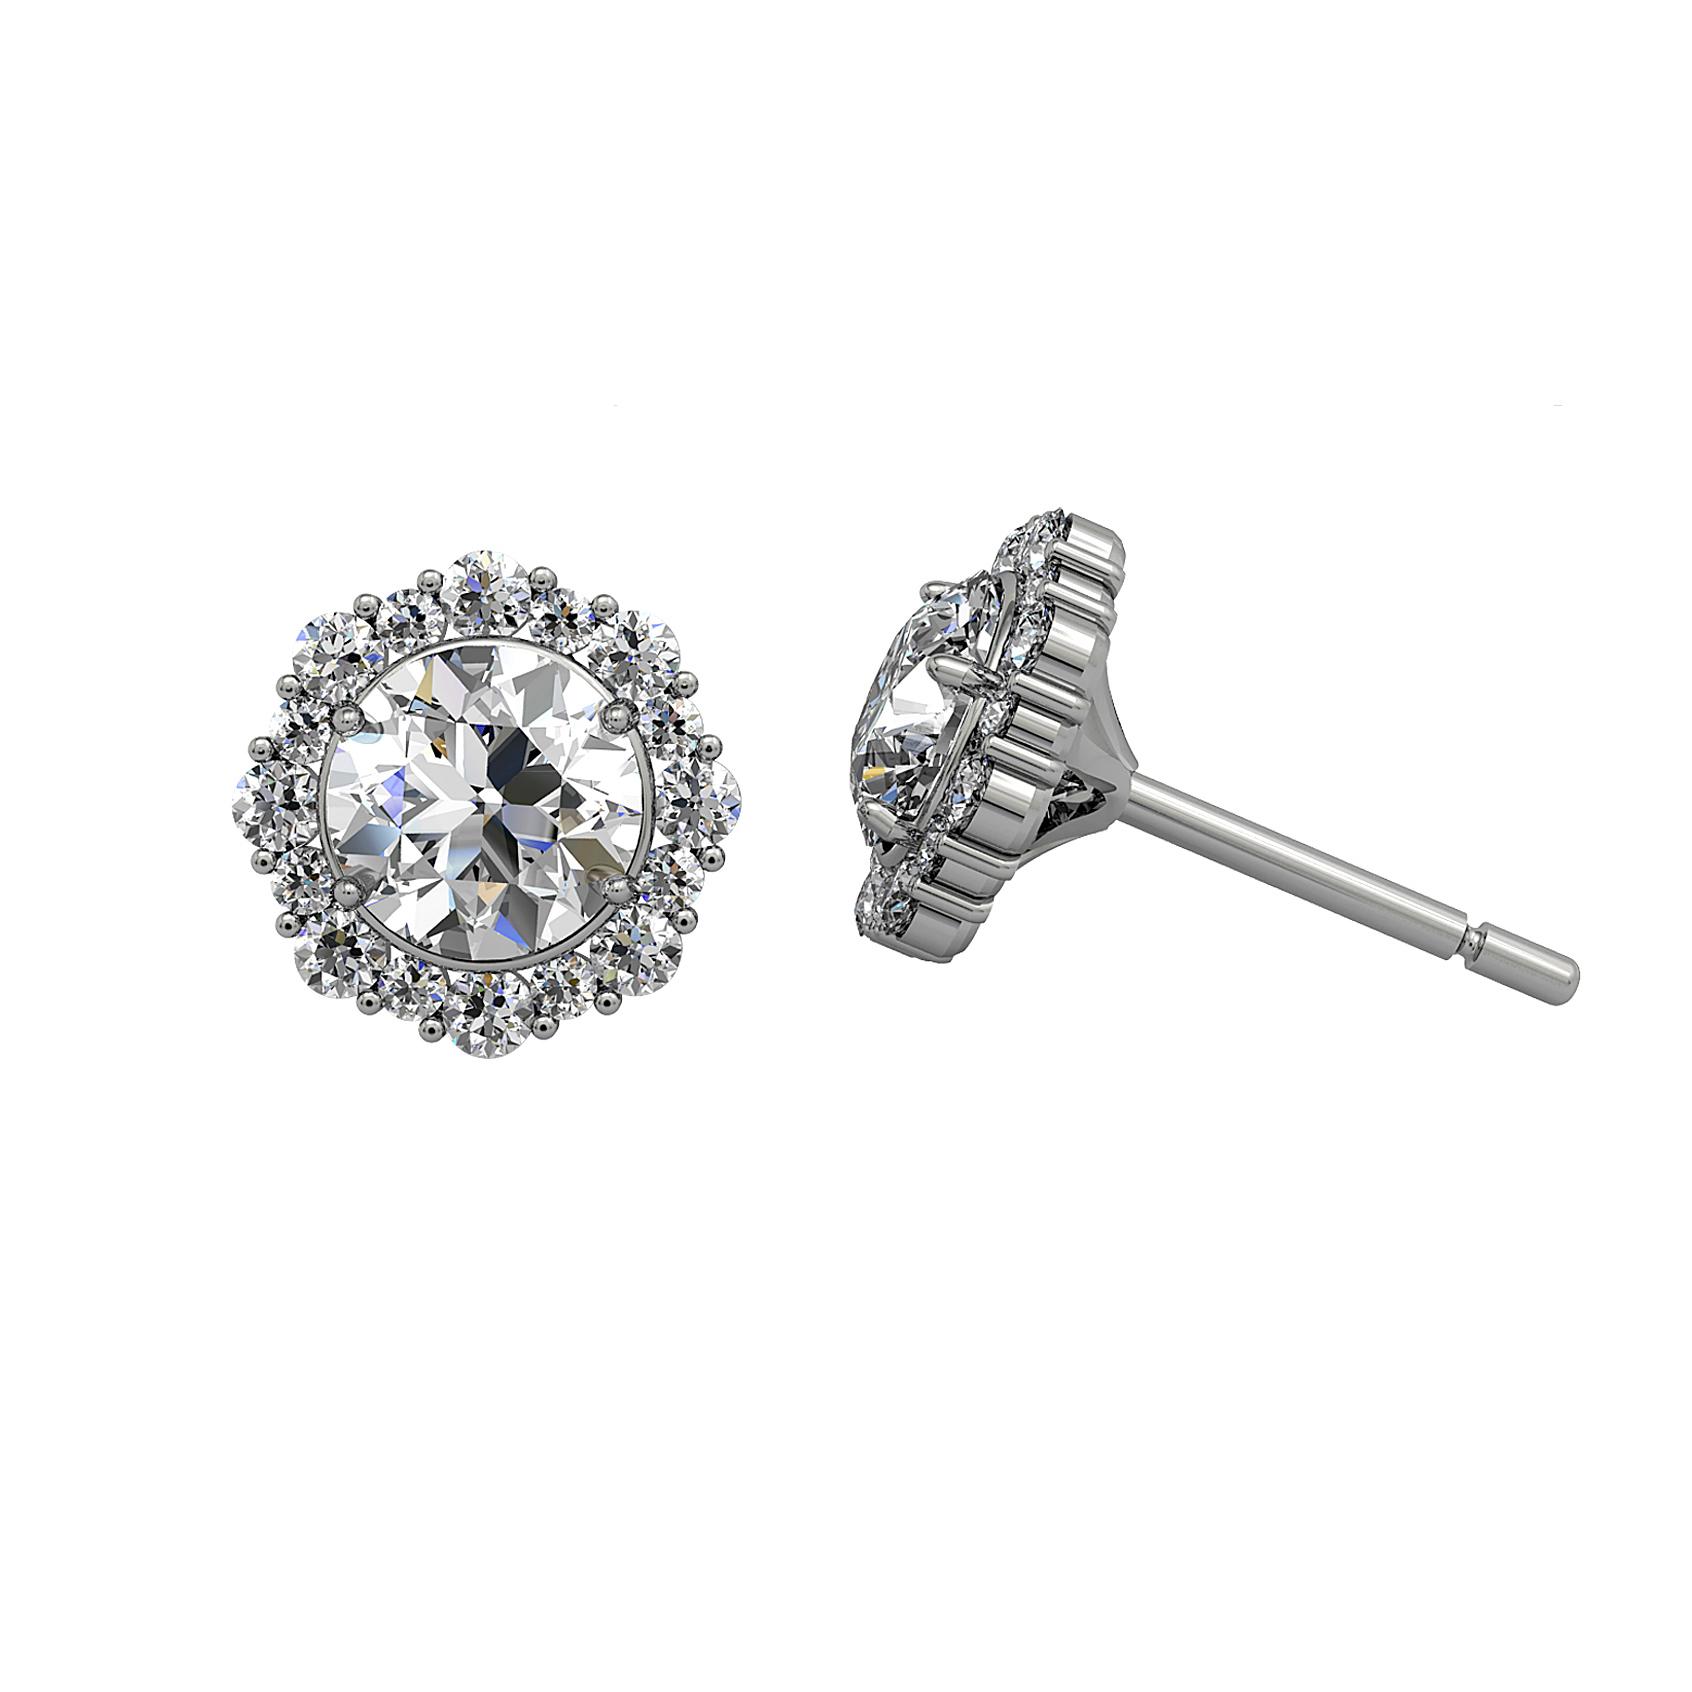 designer diamond bridal jewelry-31310.jpg